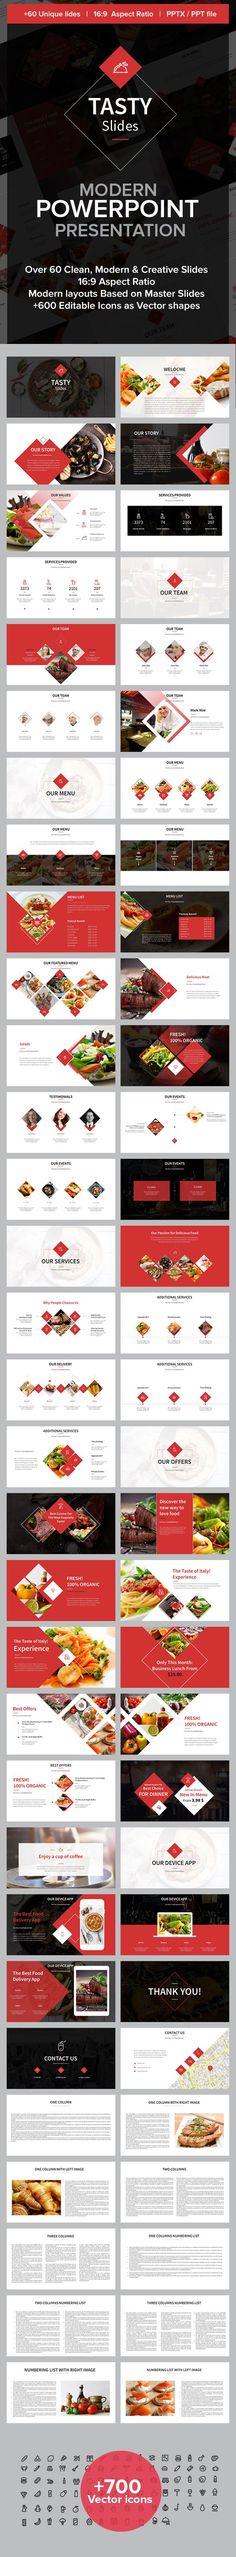 Tasty Slides Powerpoint Presentation — Powerpoint PPT #design #meal